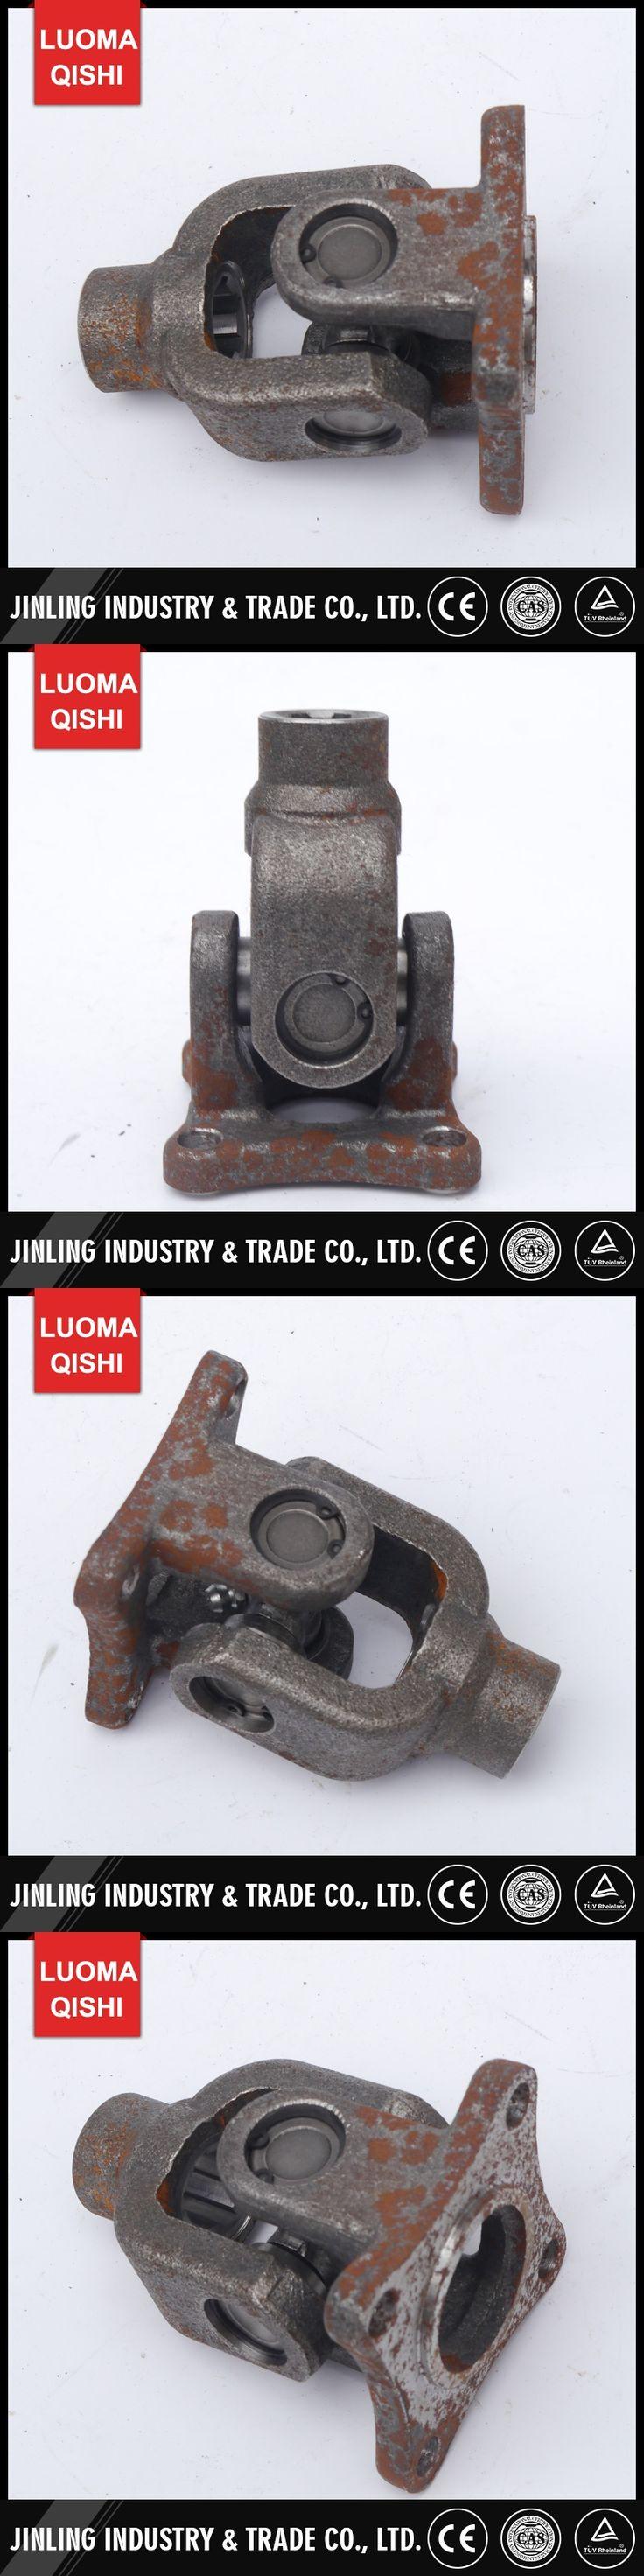 Universal Joint Drive Shaft of Jinling Quad Bike 150cc JLA-13T-2 EEC Cargo ATV Parts